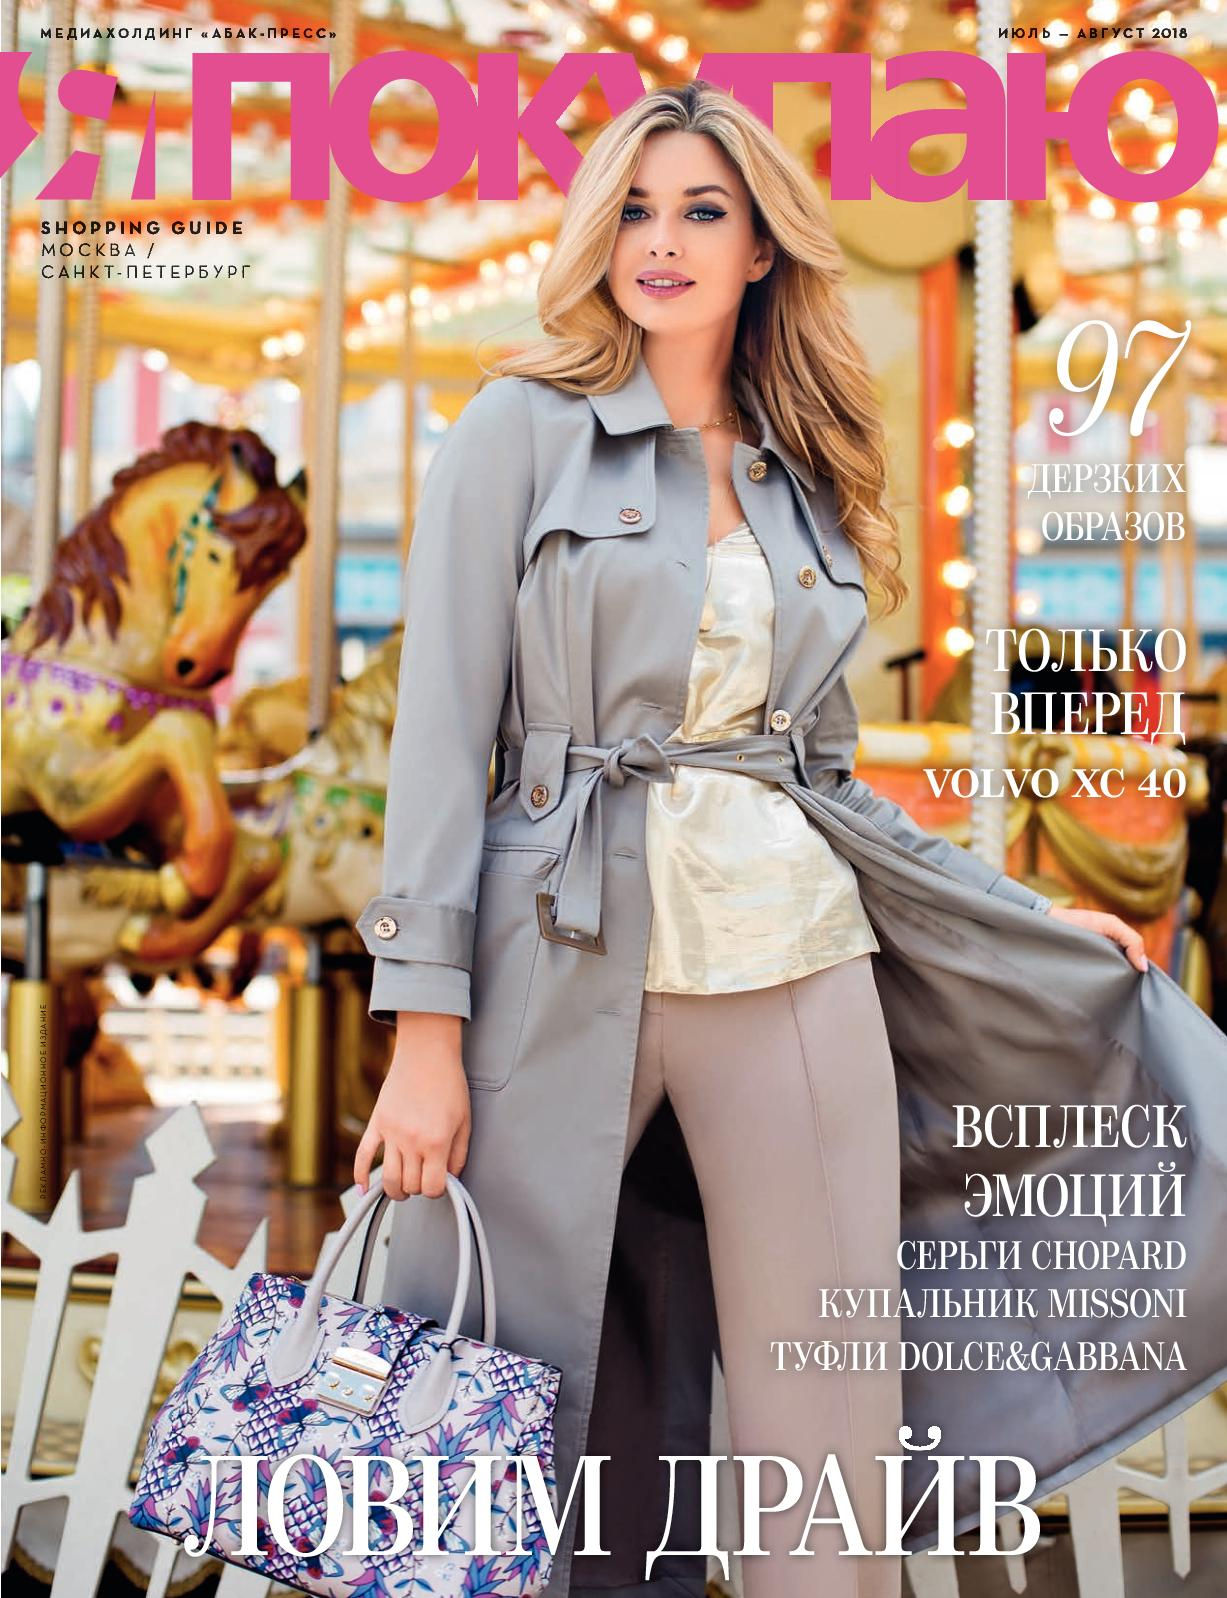 bf239003c6b Calaméo - Shopping Guide «Я Покупаю. Москва - Санкт-Петербург»